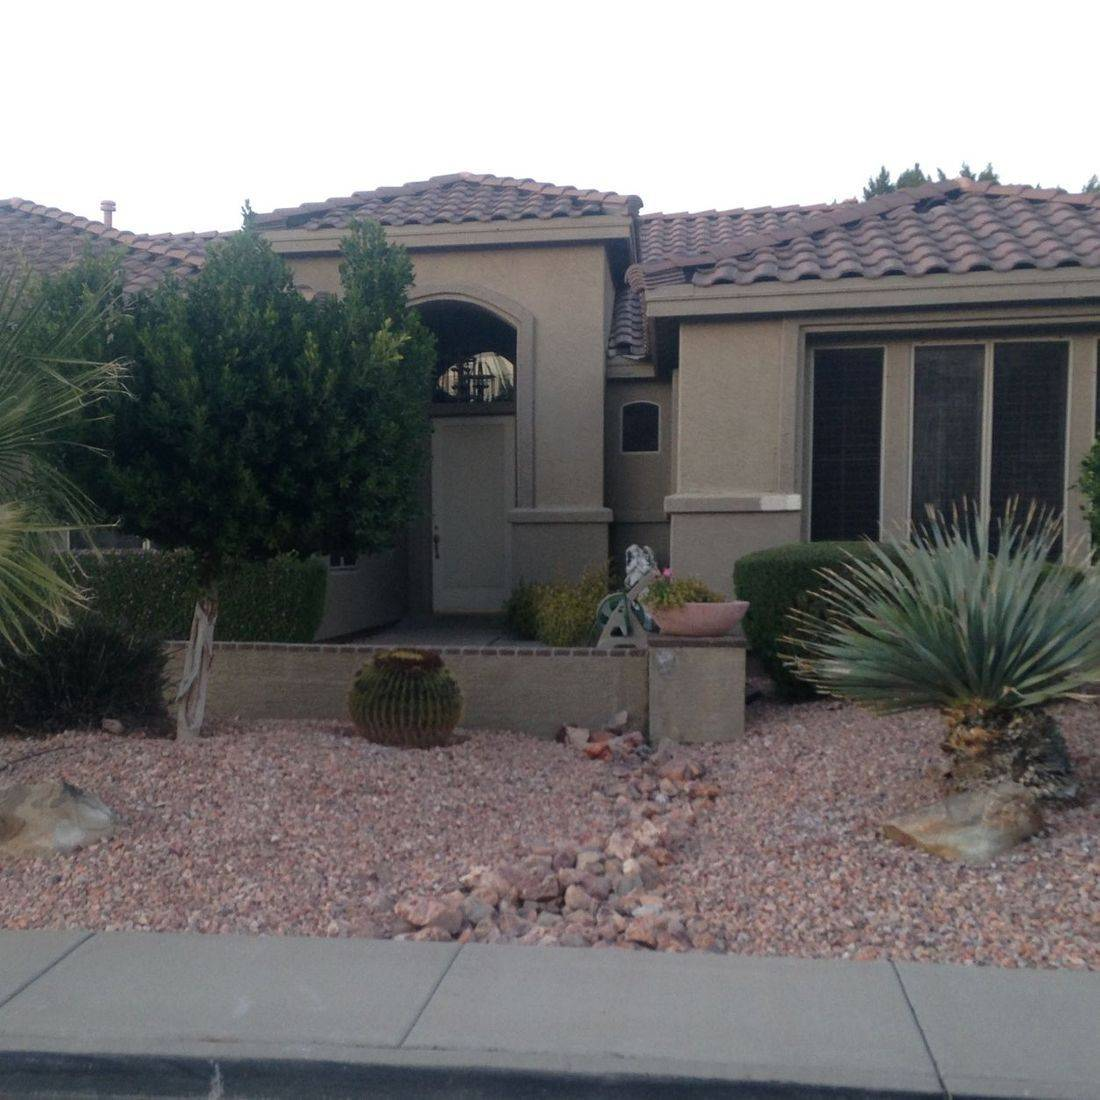 7186 W. Firebird Dr. Glendale, AZ. 85308